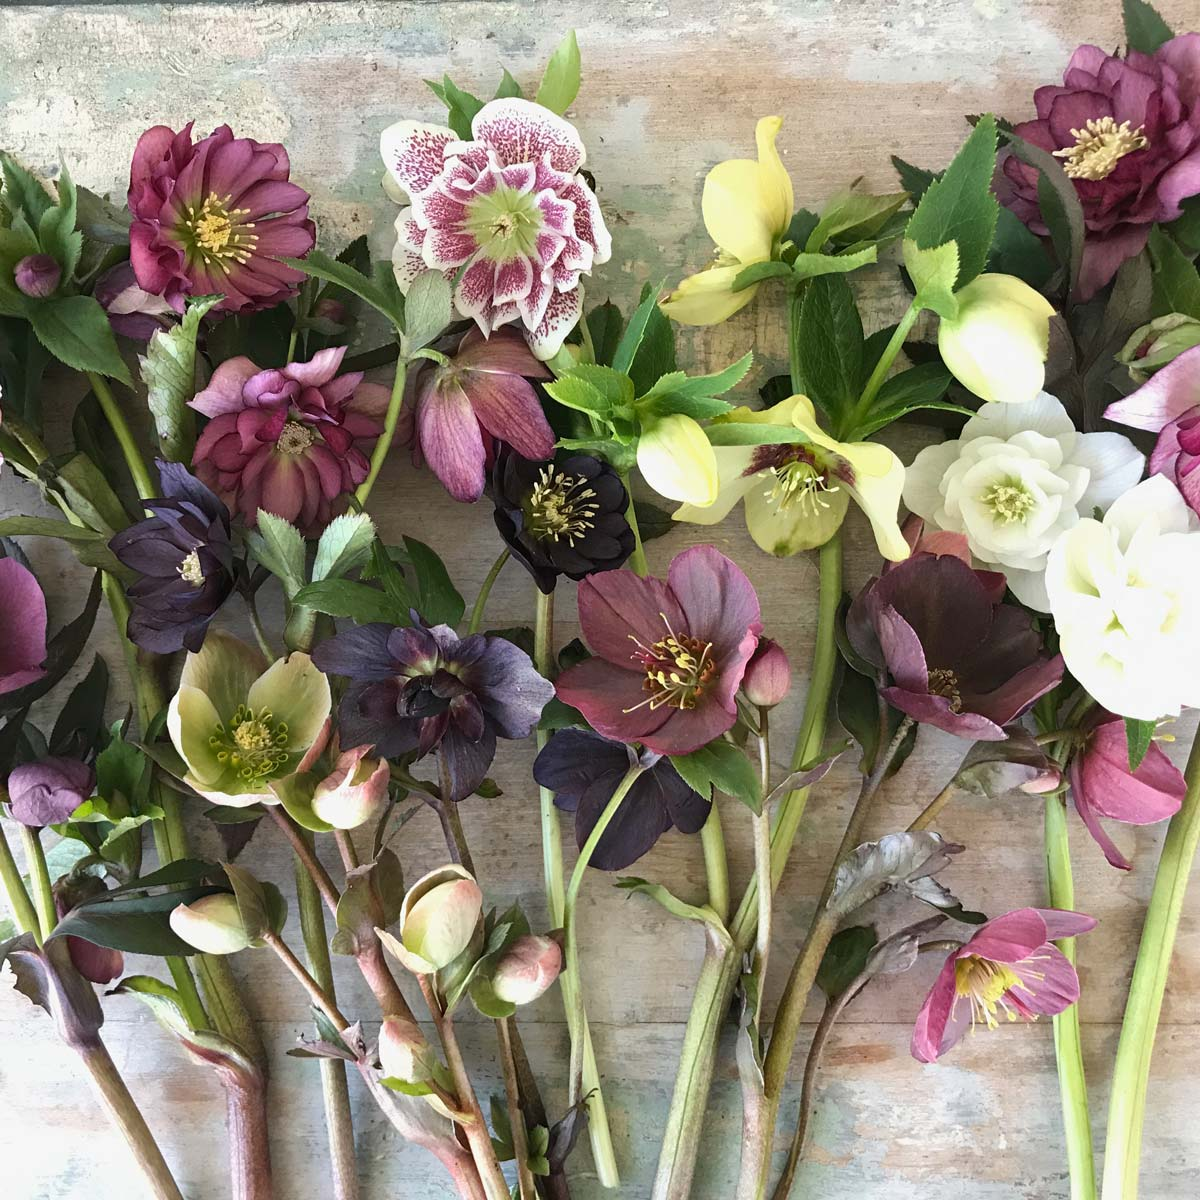 Andrea Milne • The Petaled Branch • The Good of Goshen